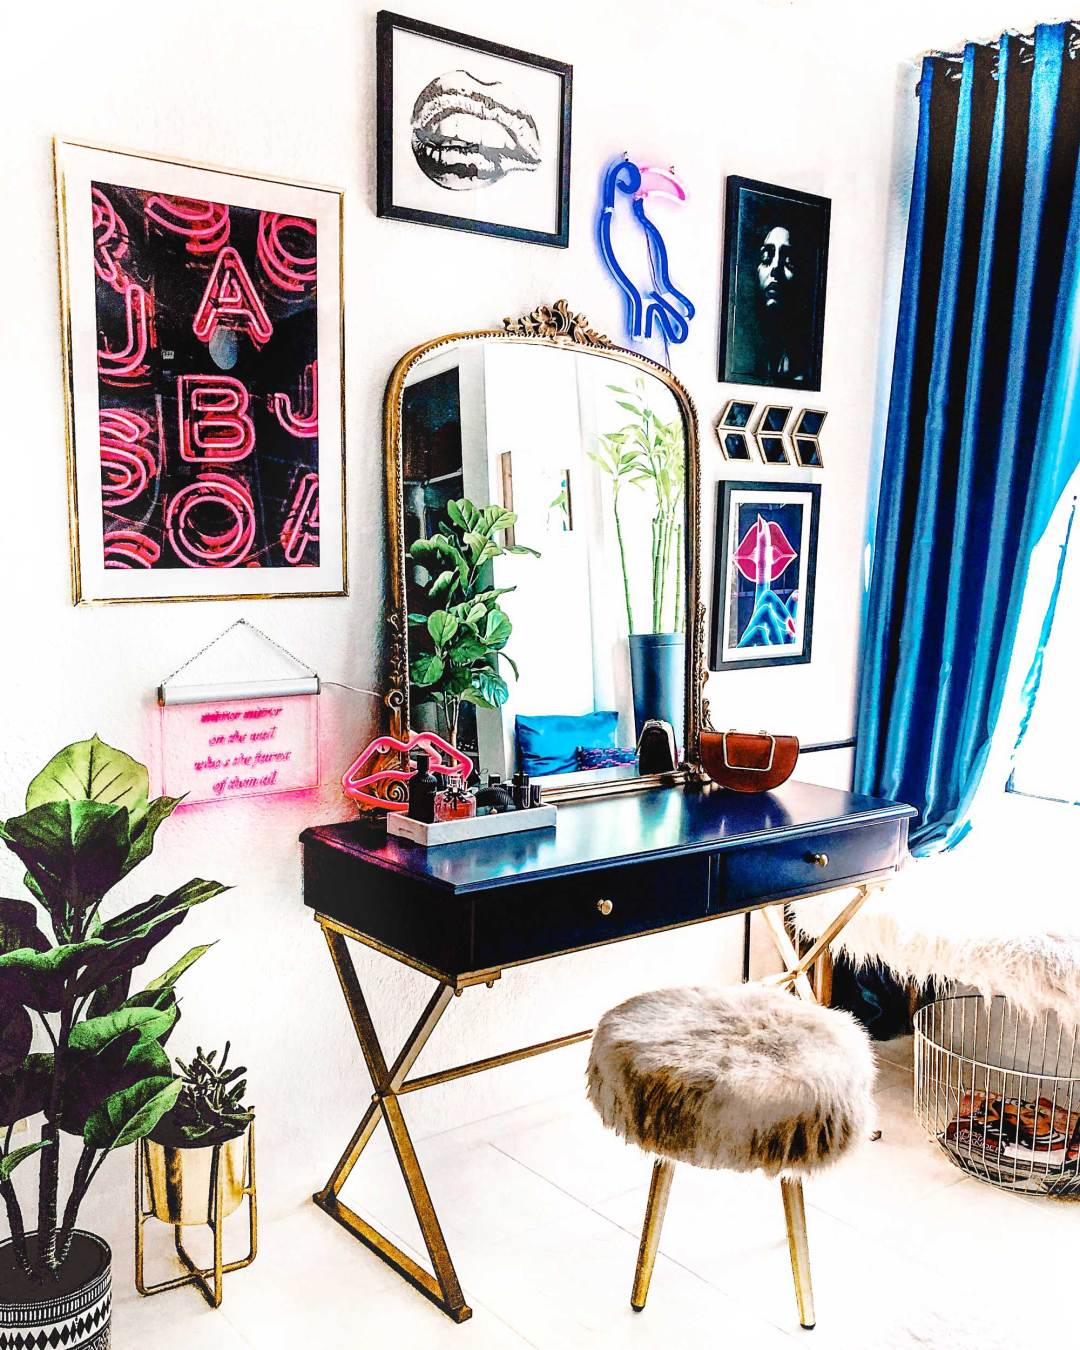 Vanity-Room-Modern Eclectic Vanity with Desenio | Free Phone and Desktop wallpapers download